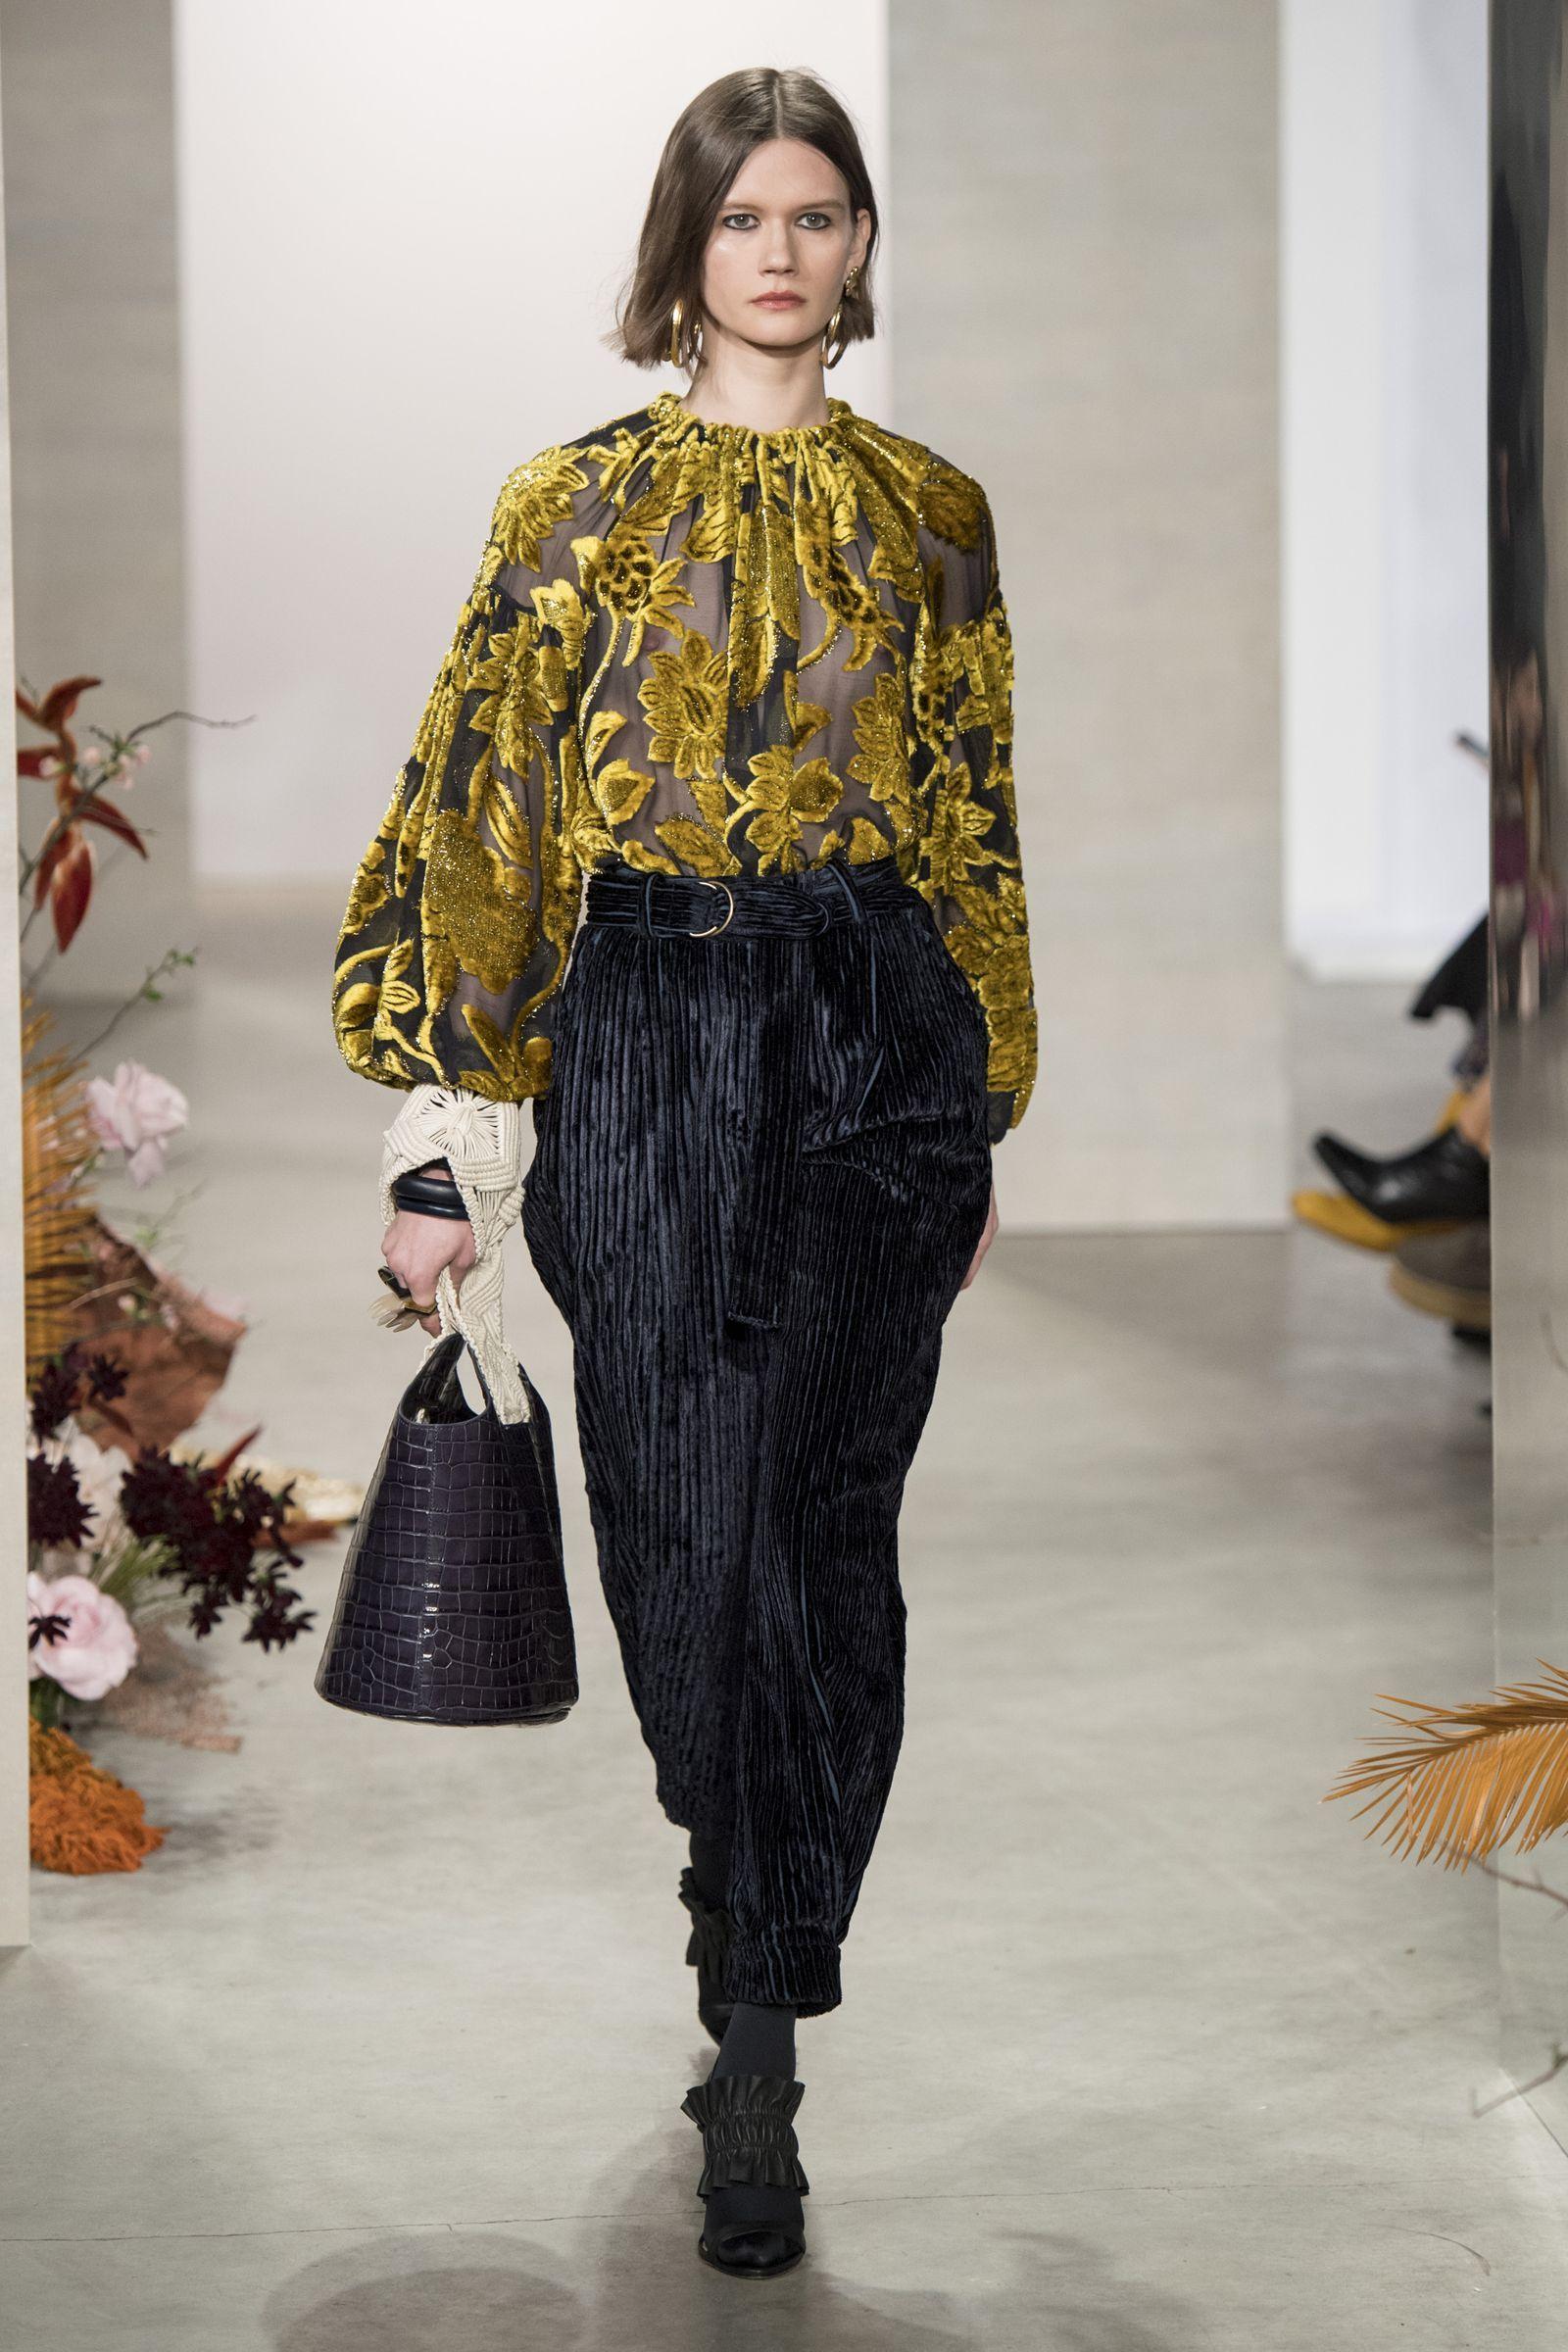 7244cafa4b70 Pantalone Moda Donna 2019 2020marieclaireita. Pantalone Moda Donna 2019  2020marieclaireita Sari, Pret À Porter, Passerella, Sfilata Di Moda